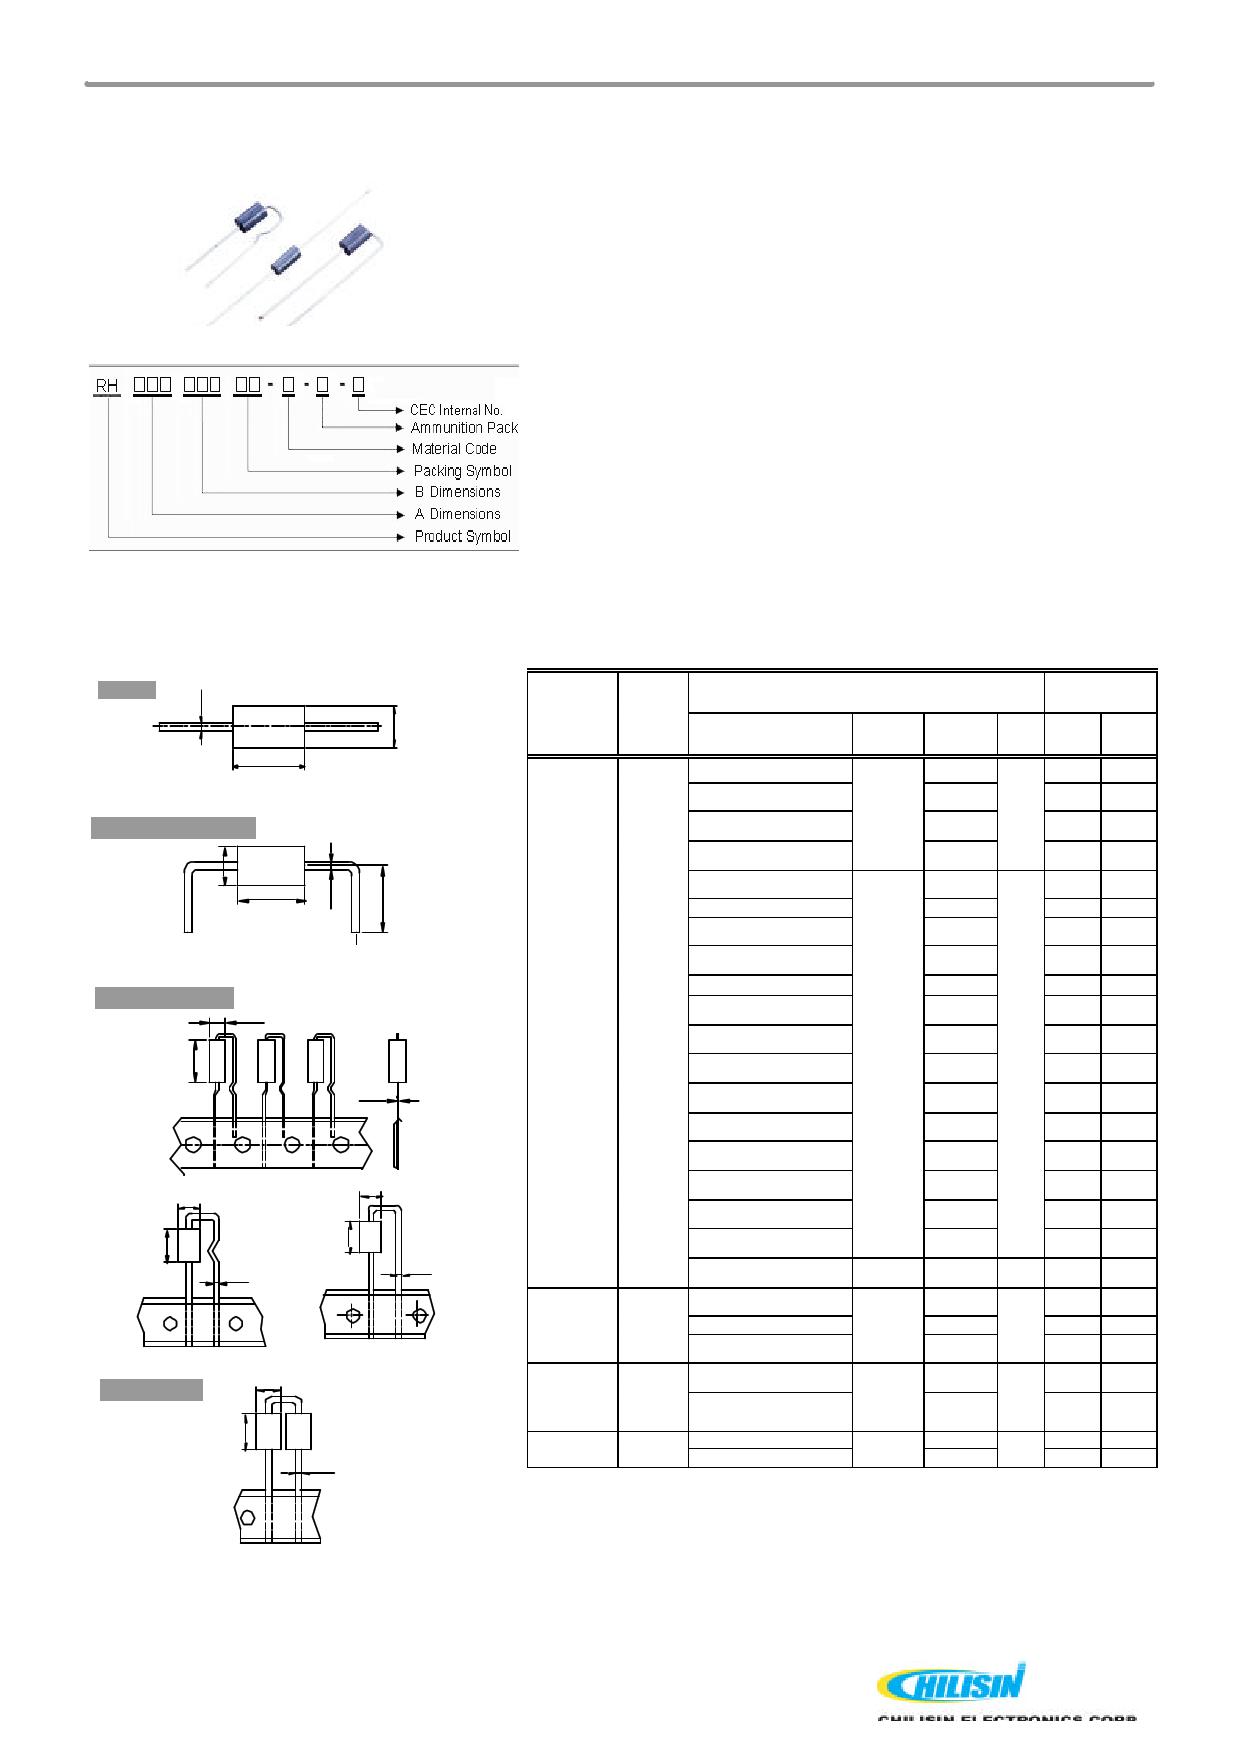 RH035115 데이터시트 및 RH035115 PDF